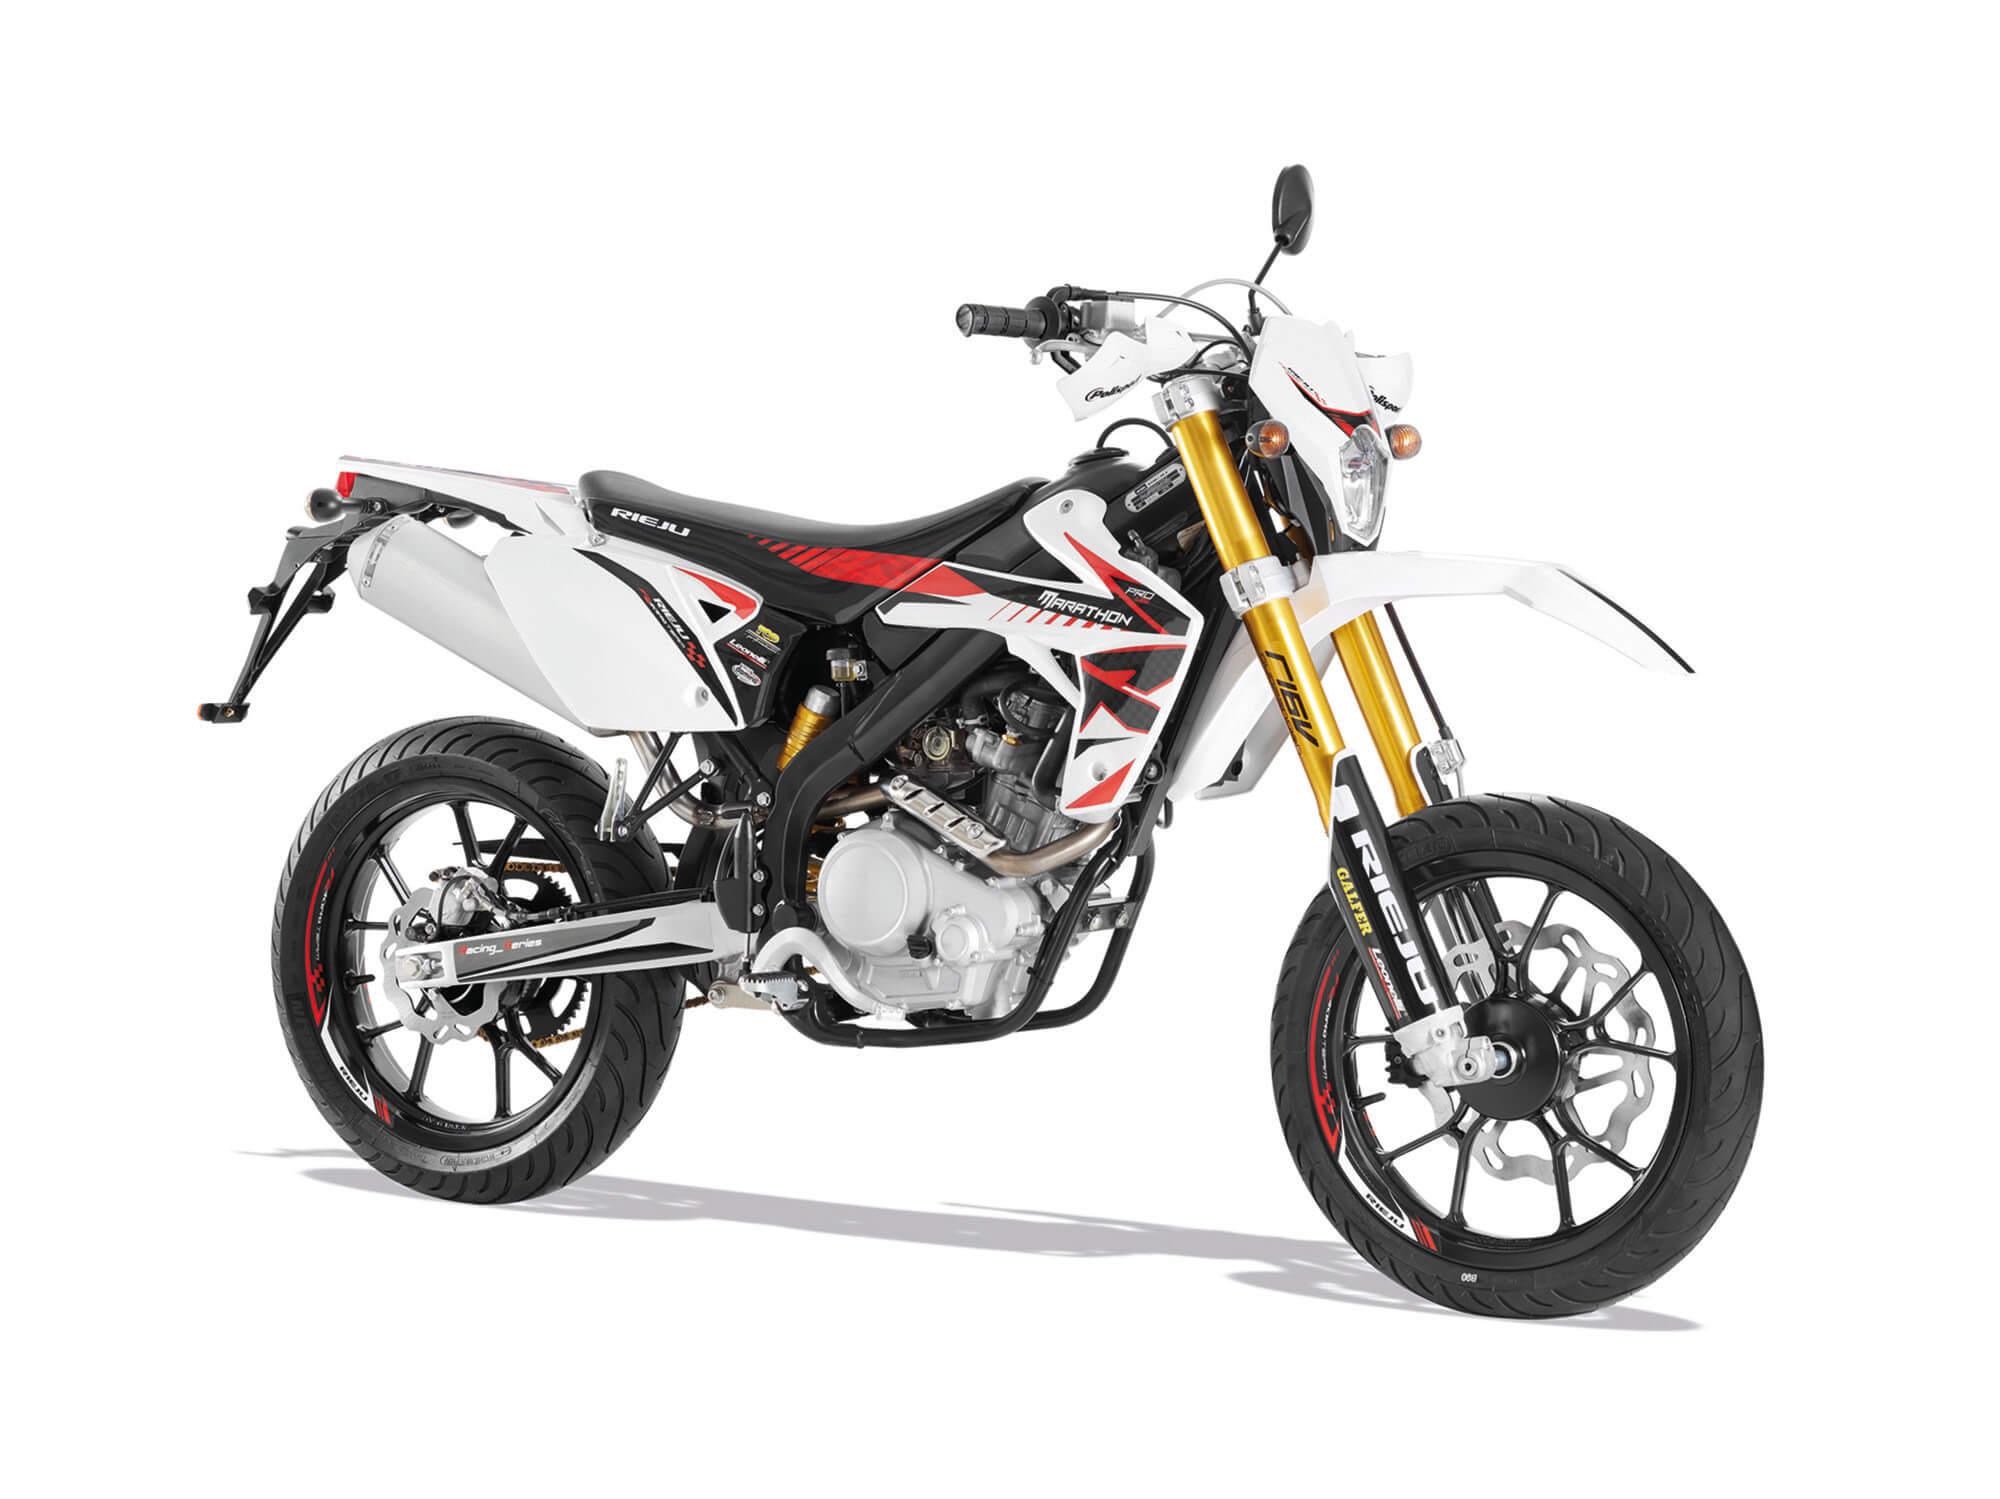 comprar-motos-rieju-marathon-pro-supermotard-125-blanco-motissimo-barcelona